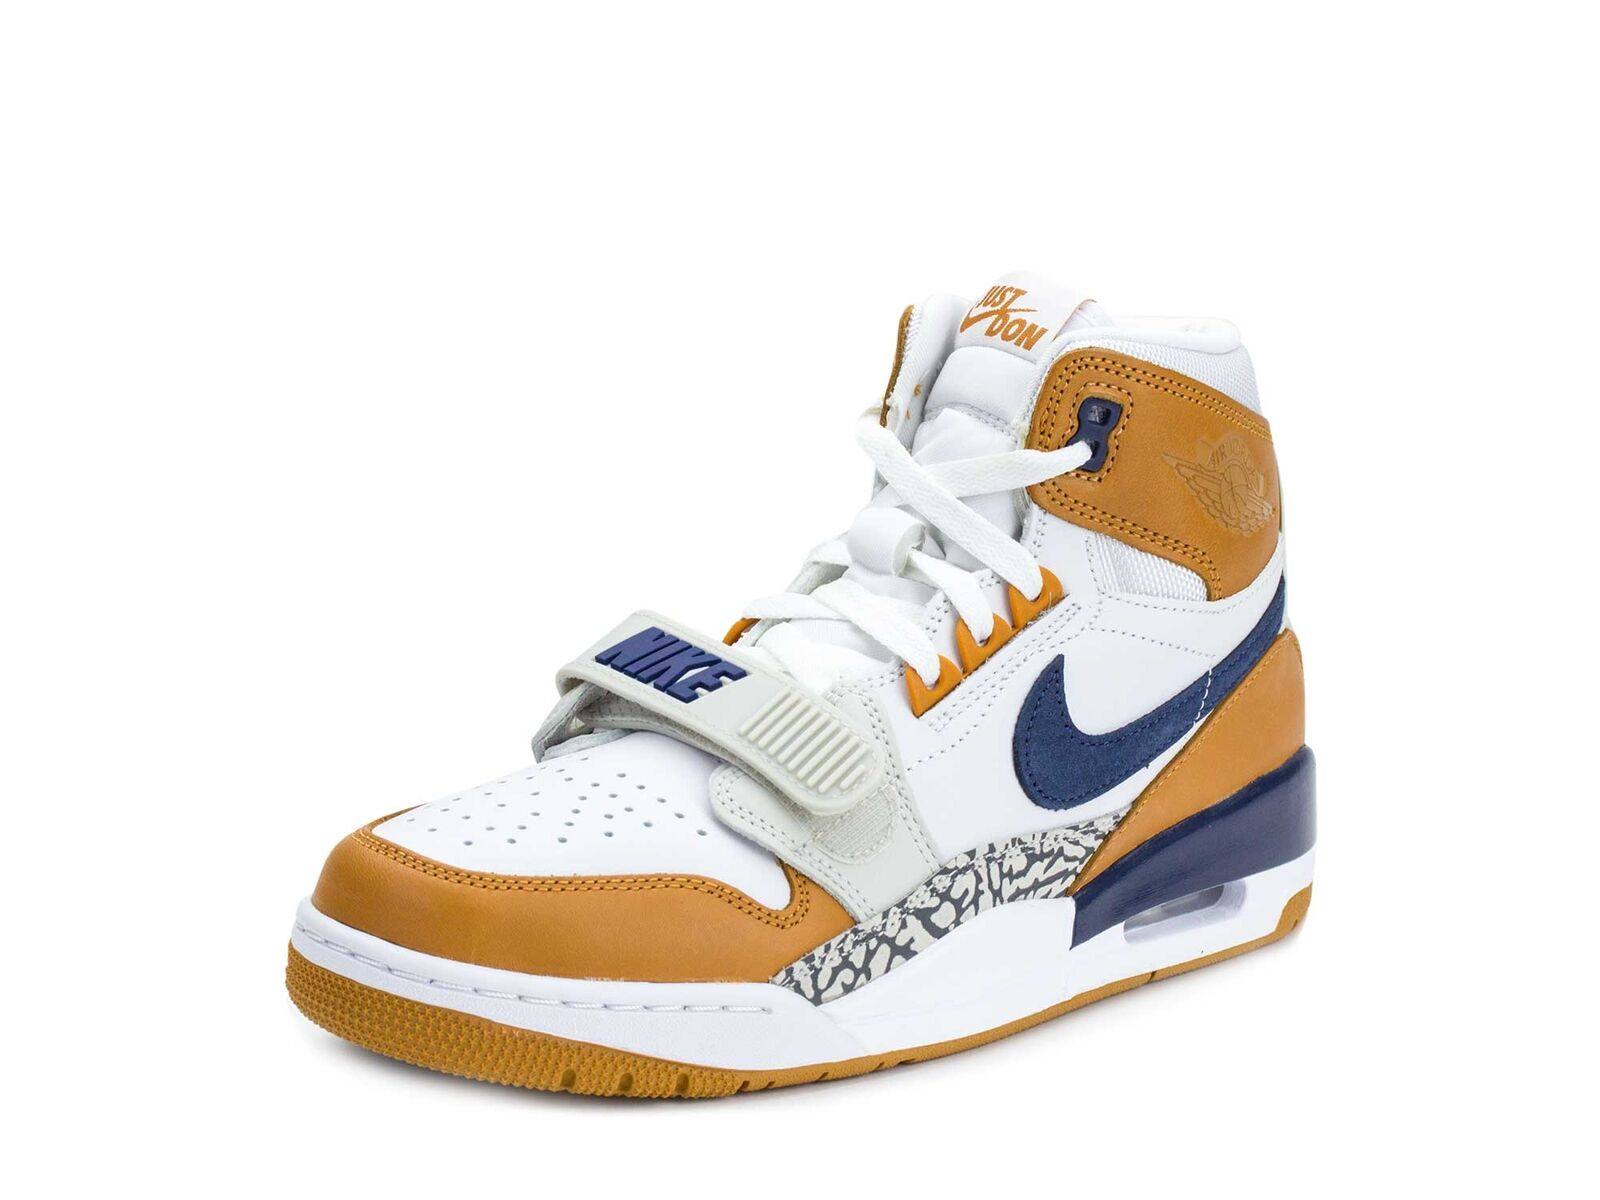 Nike Hommes Air blanc Jordan Legacy 312 NRG Just Don blanc Air /Navy-Ginger AQ4160-140 938e13